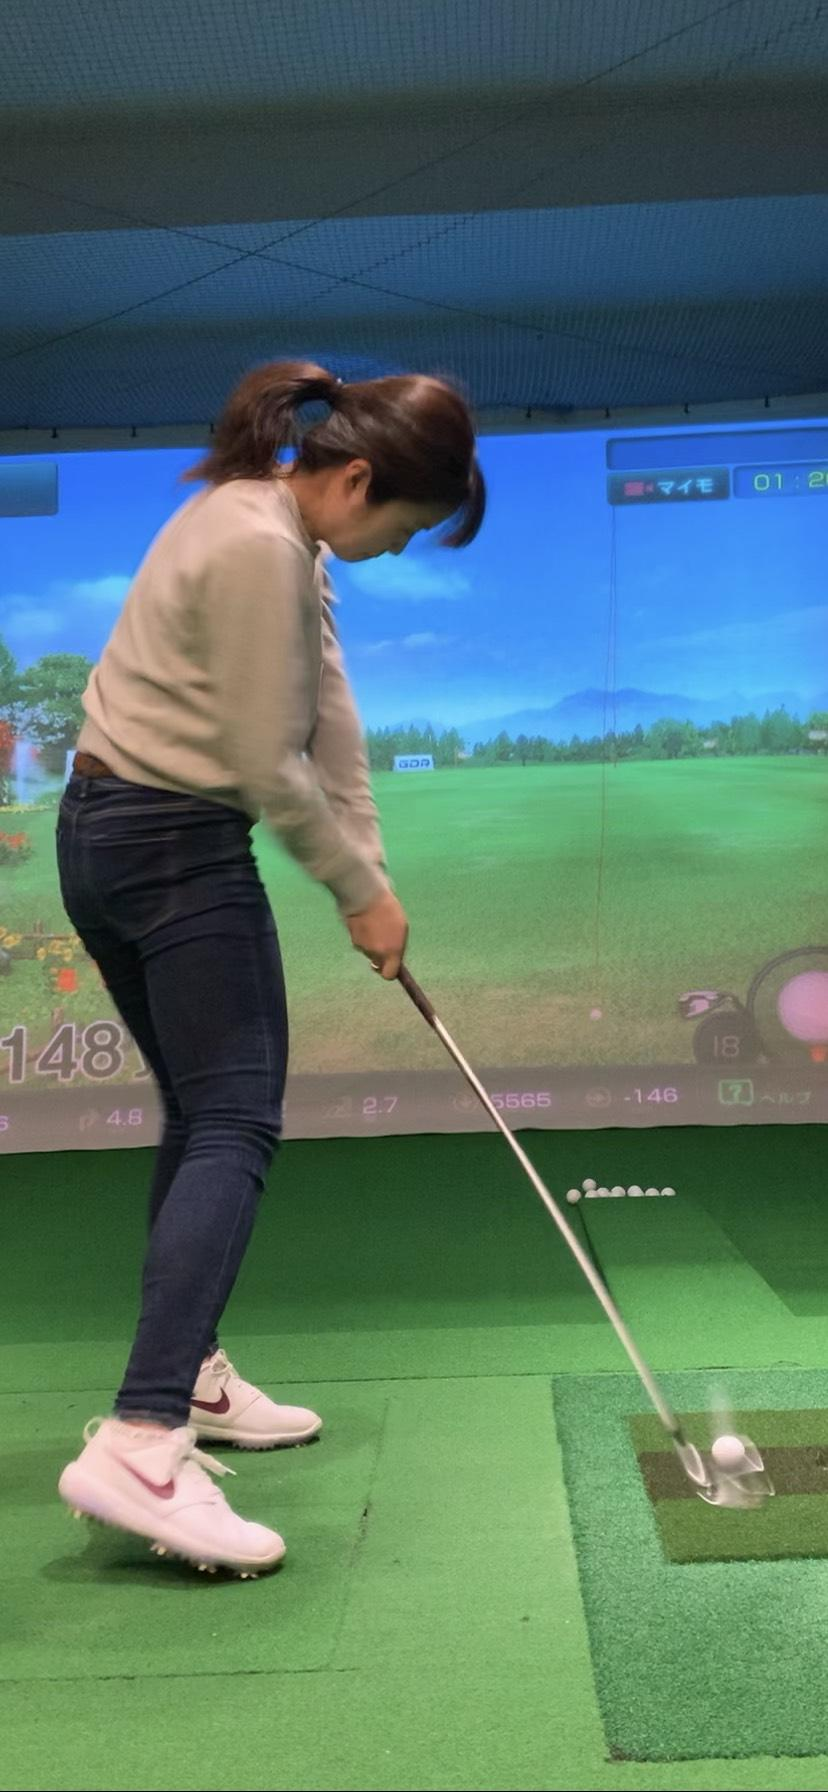 https://www.bs-golf.com/pro/1c61f7d968e2834a2b5a44befe382b46f6df0c9d.JPG